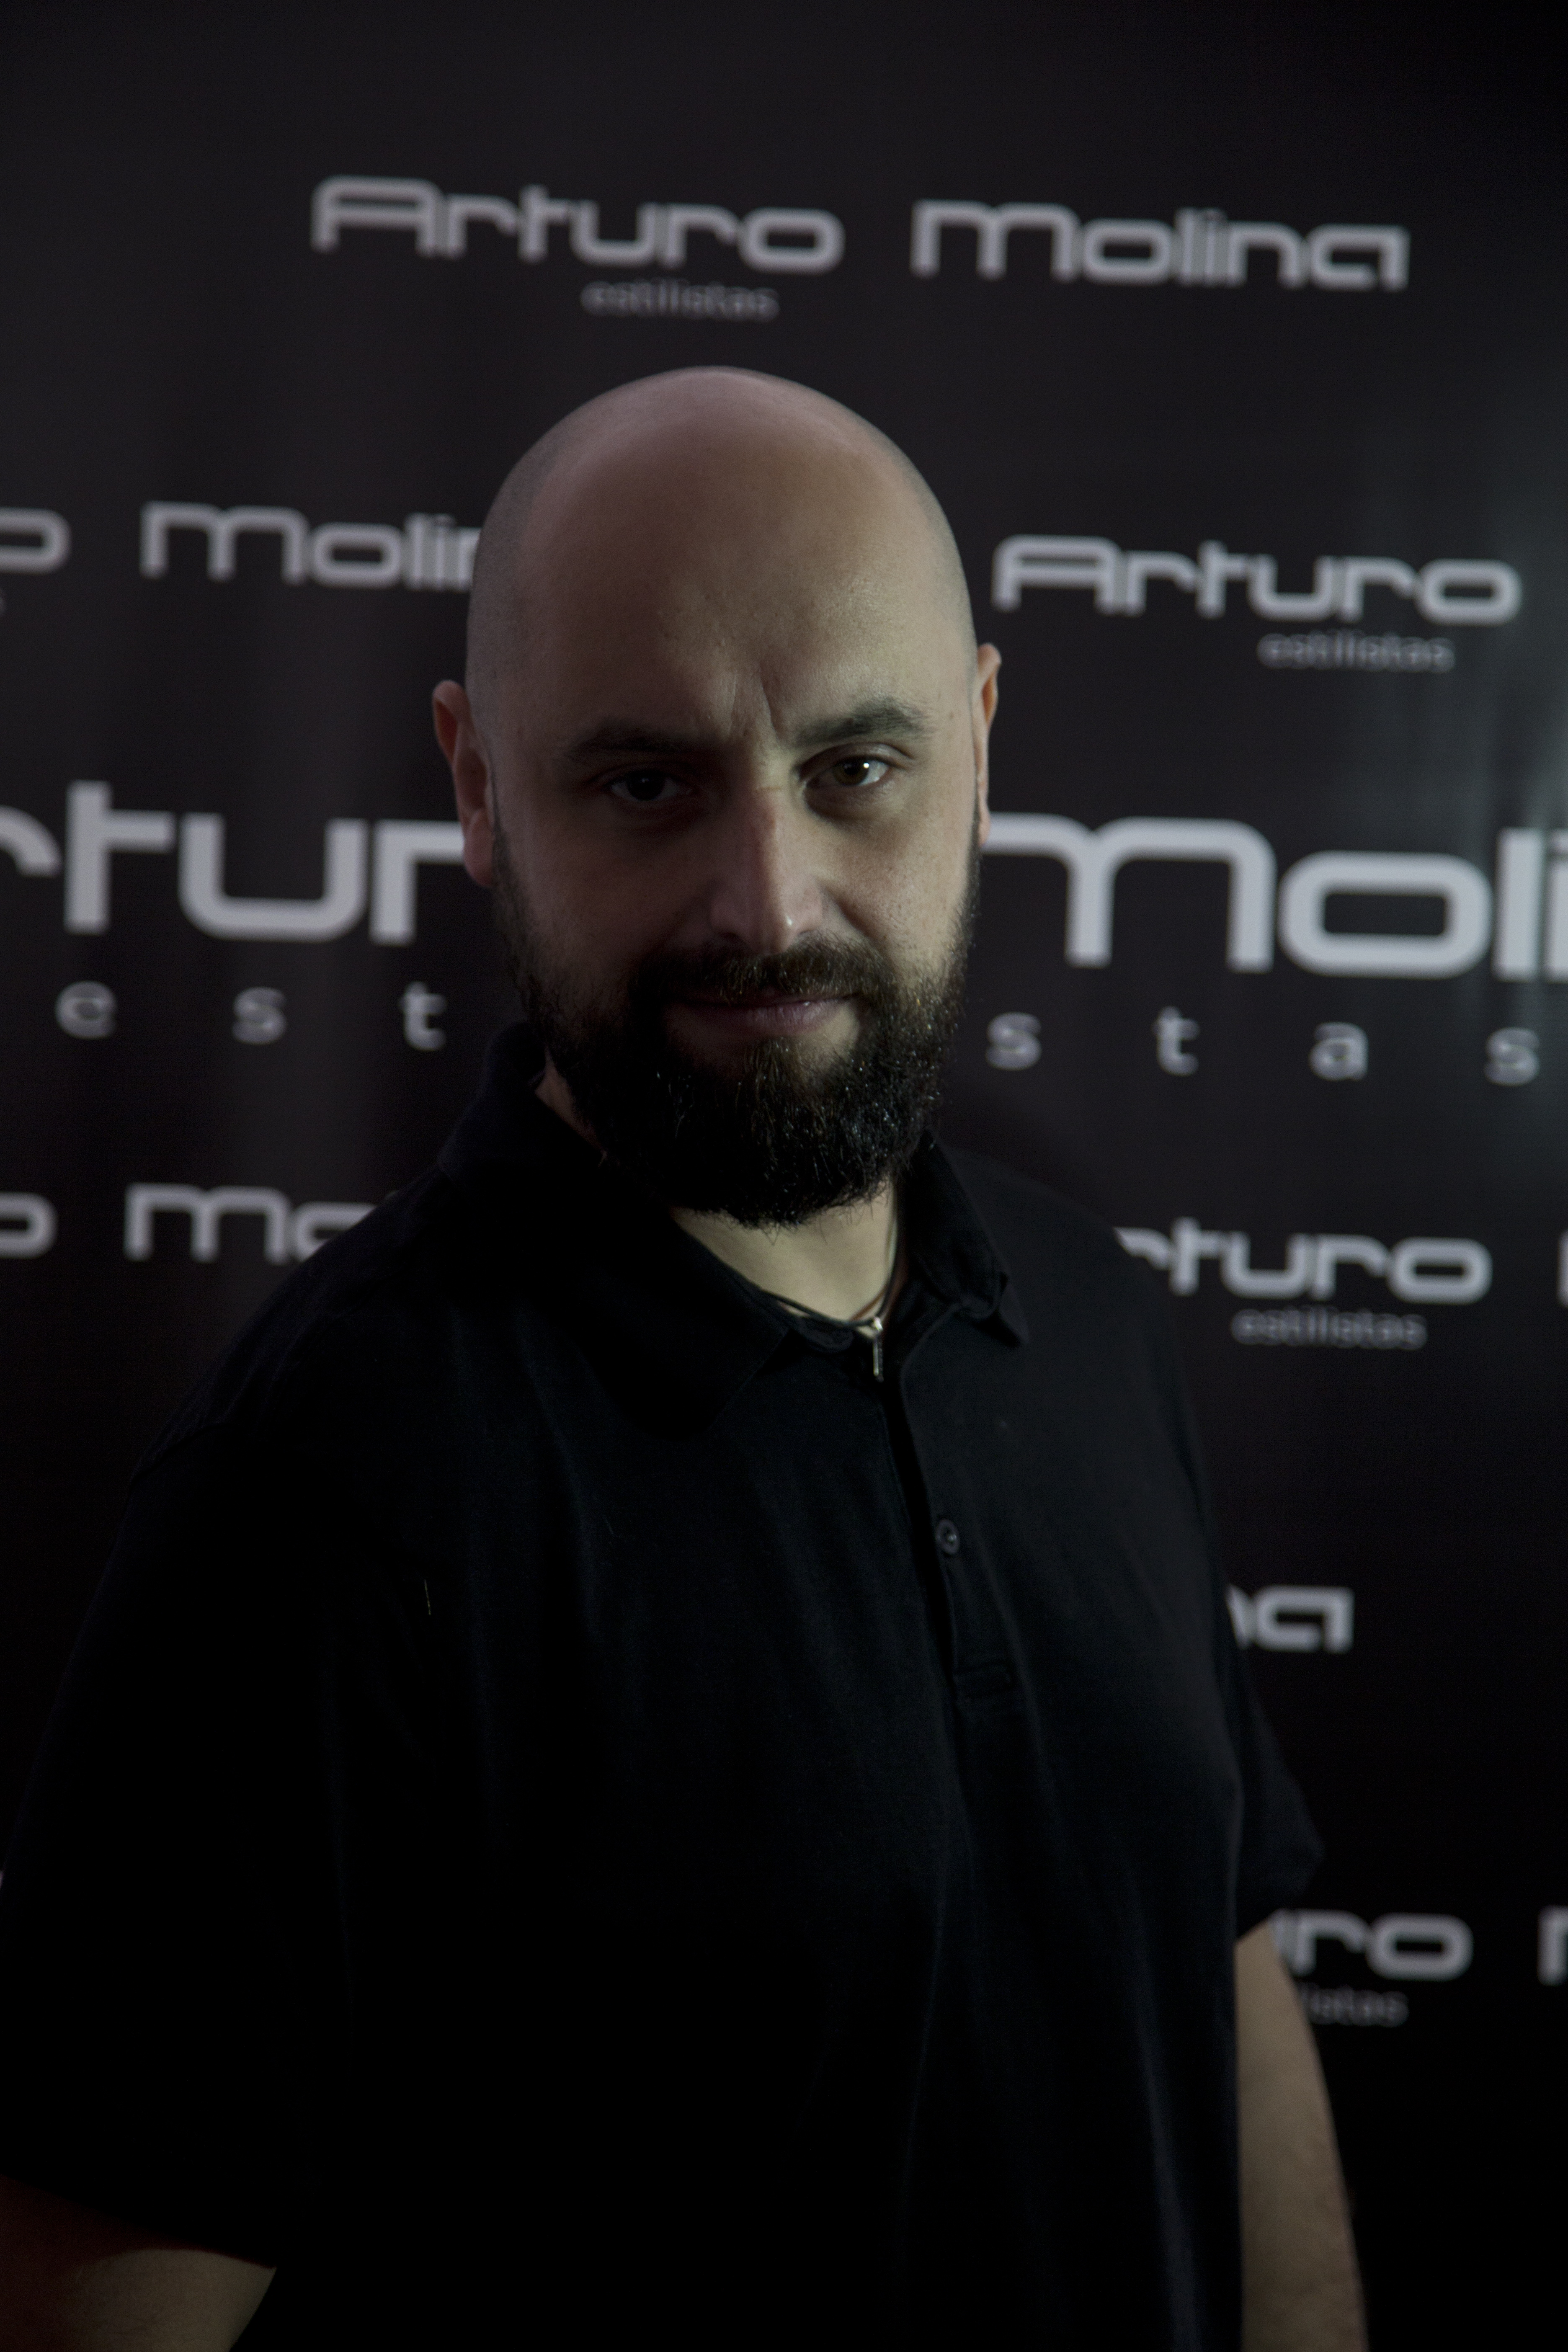 ArturoMOLINA-52